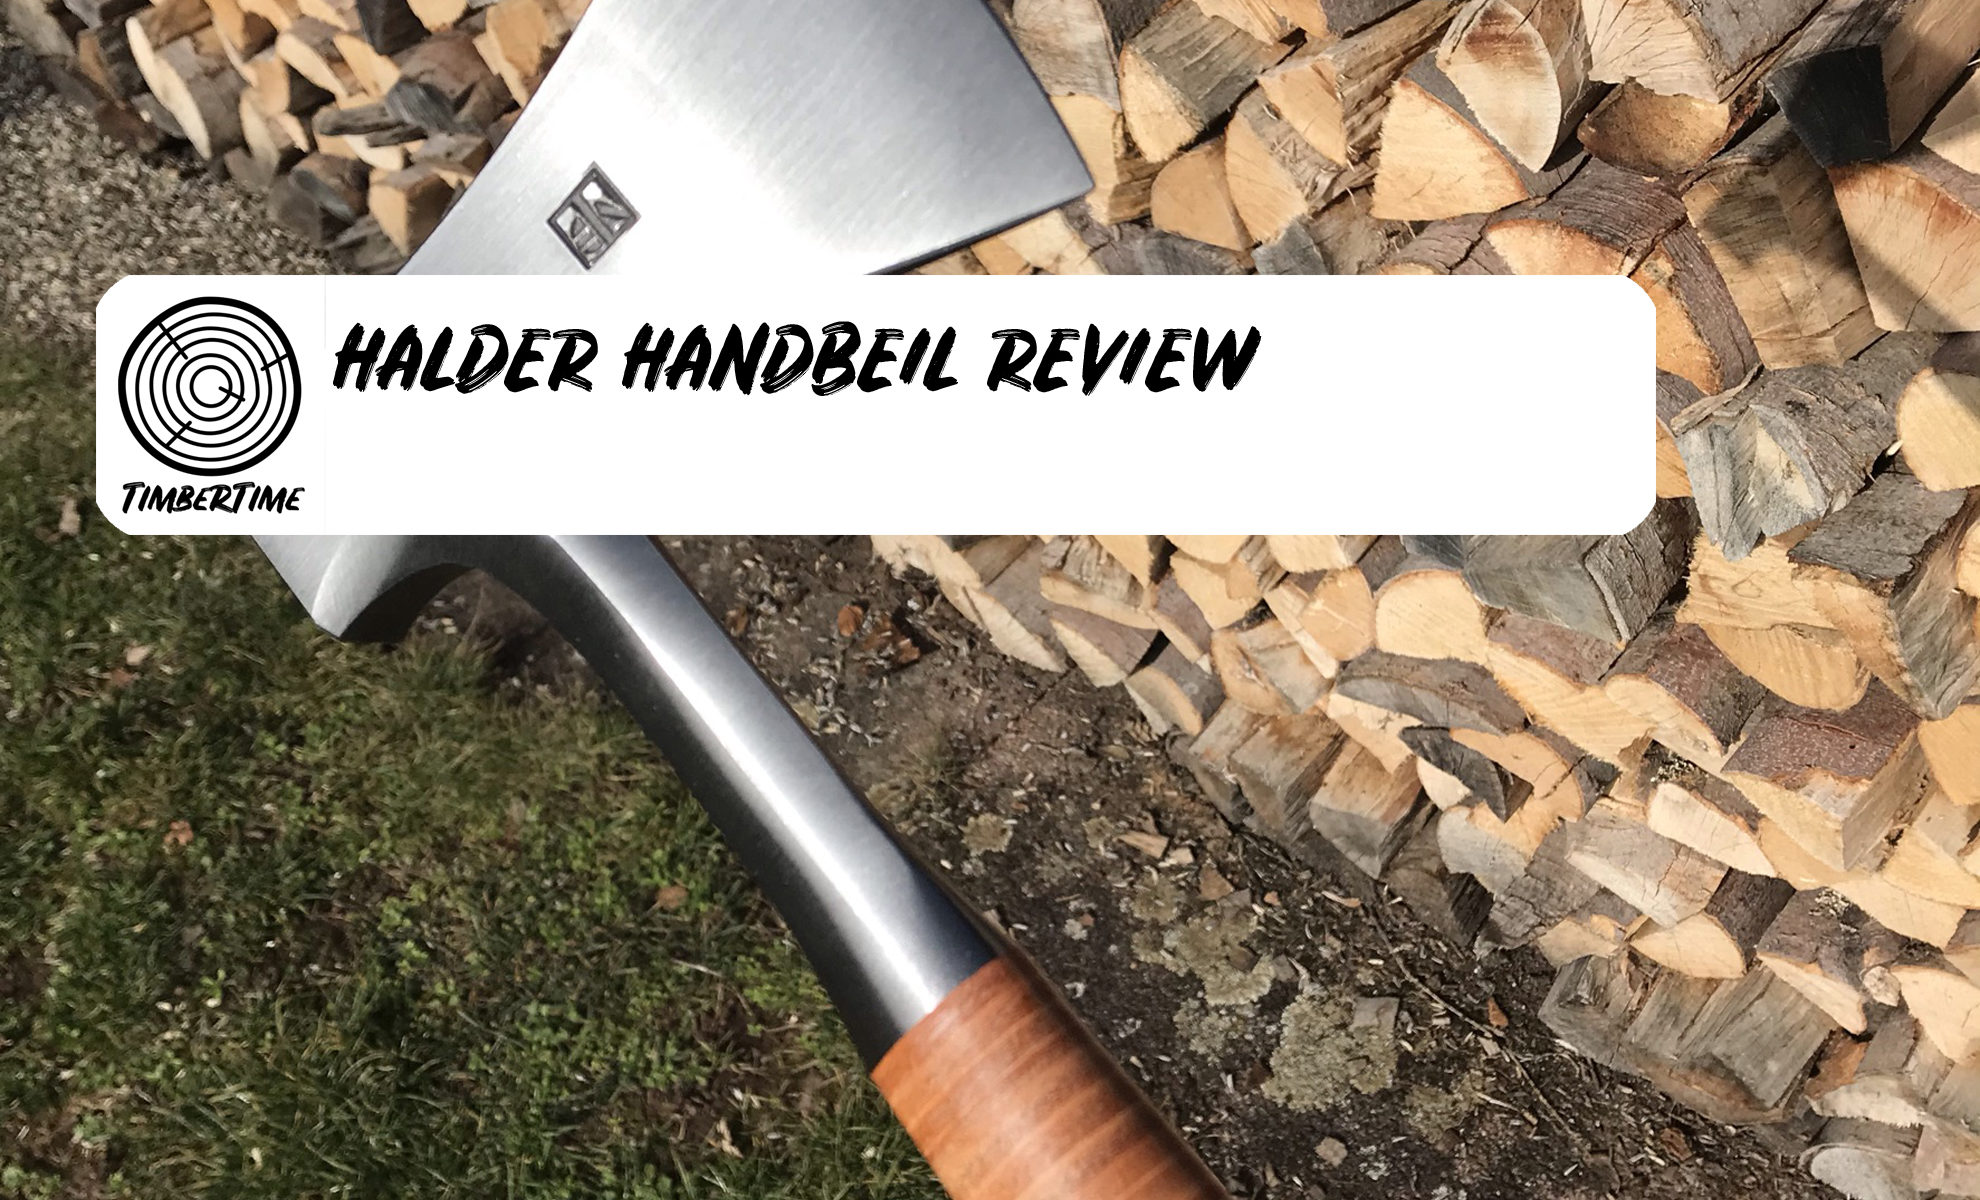 Halder Handbeil Review